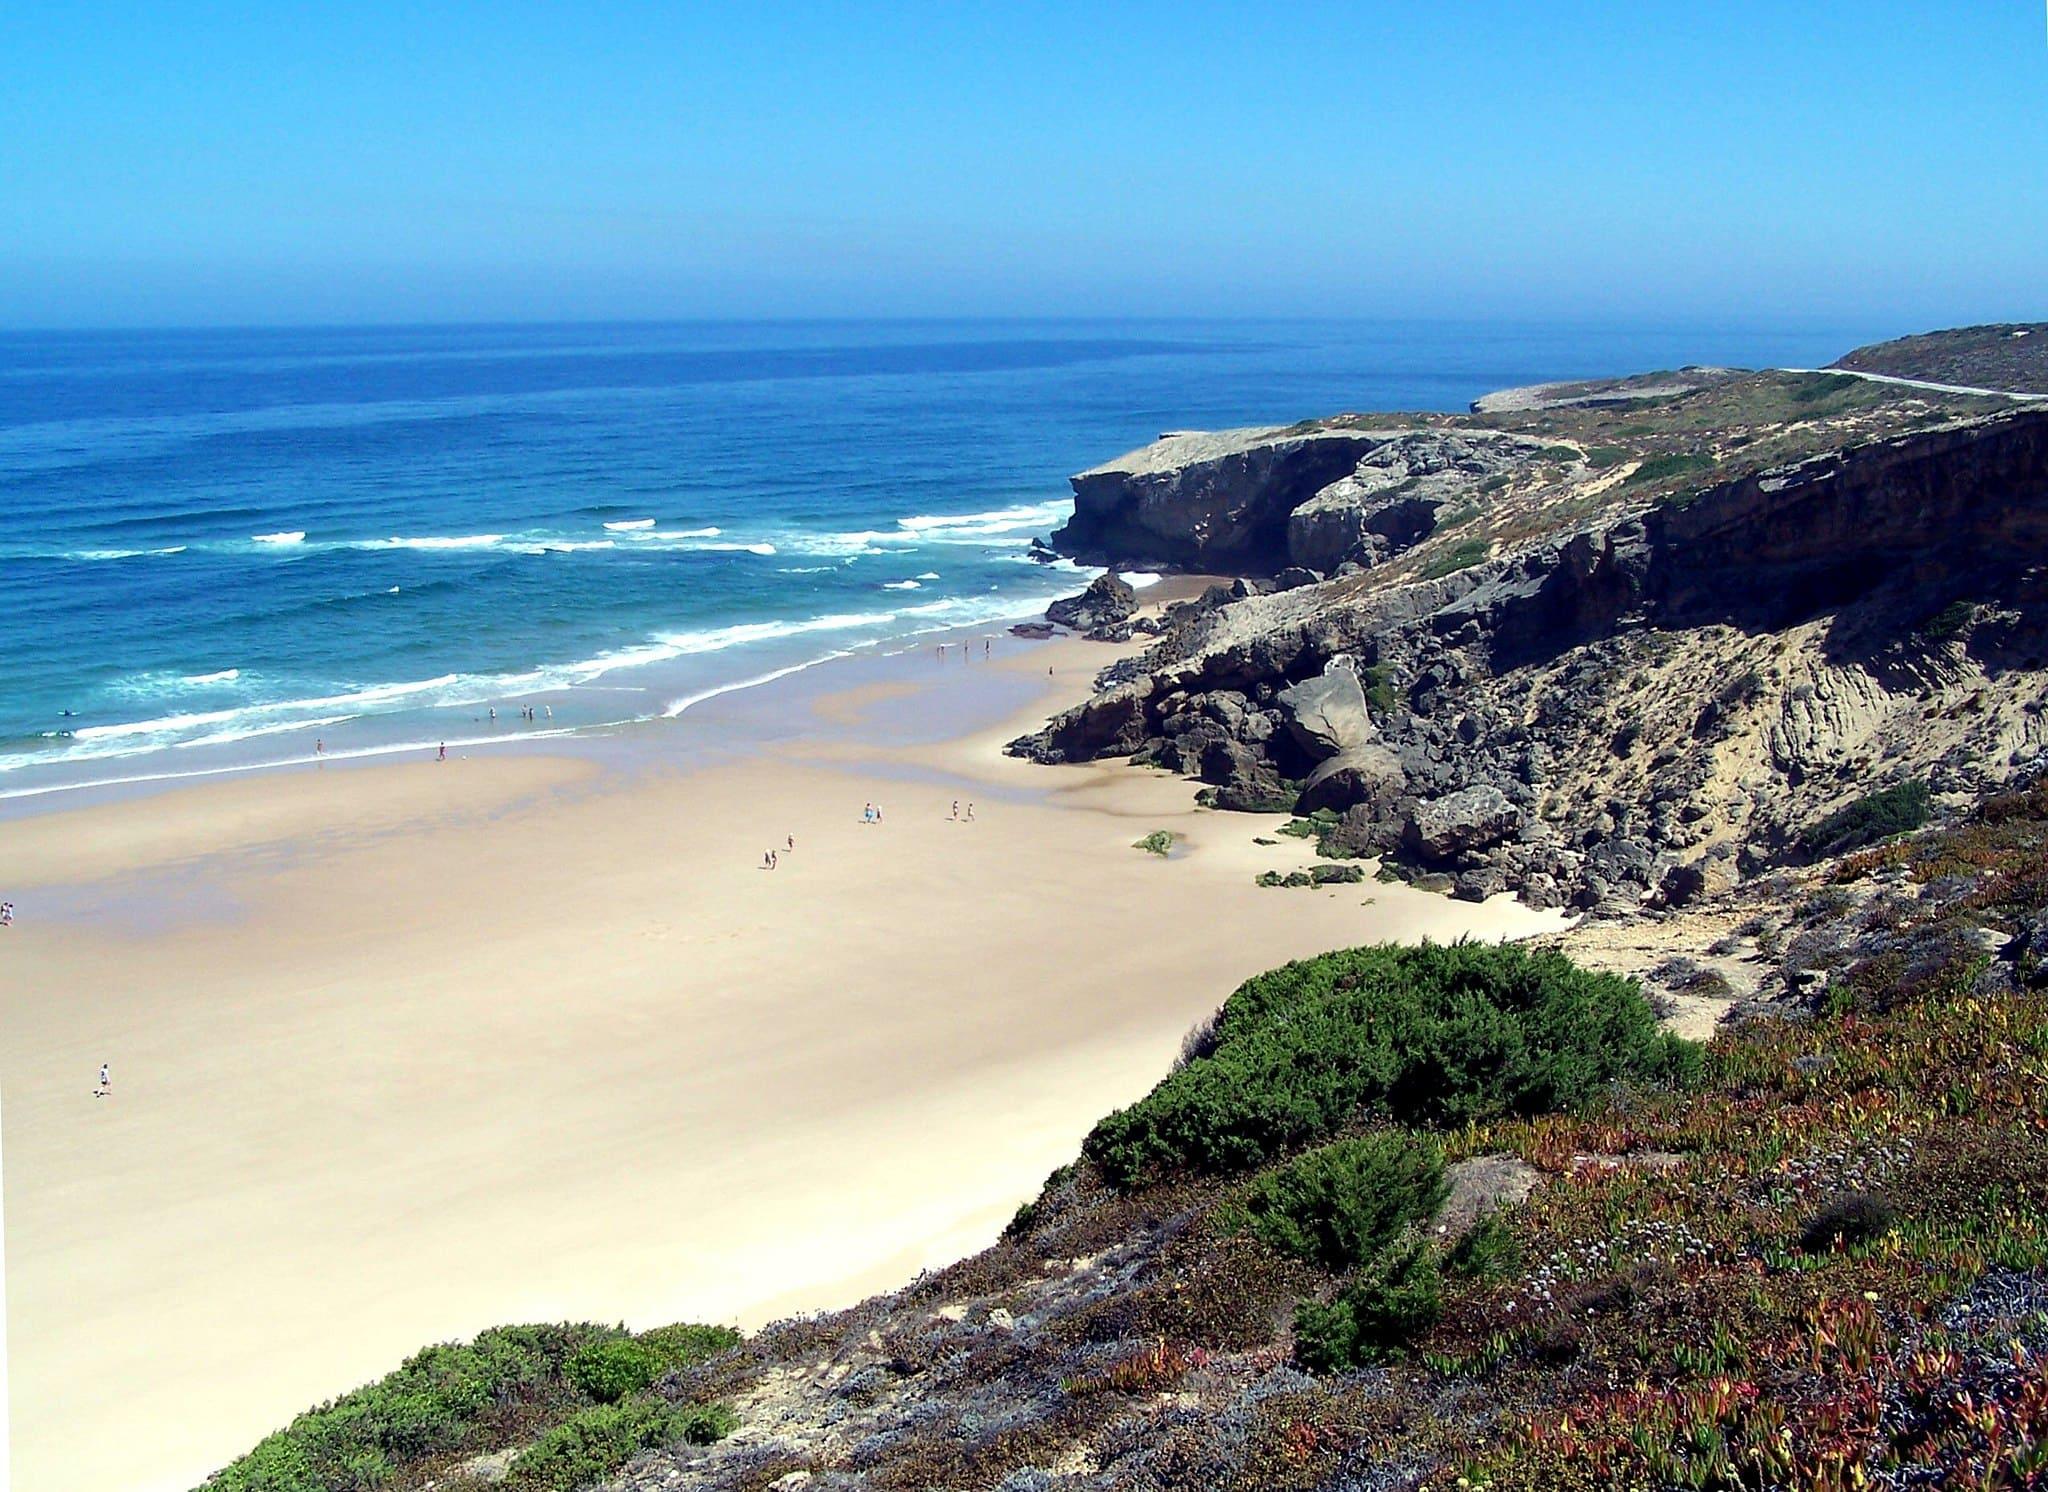 Beaches in Algarve, Praia do Monte Clerigo